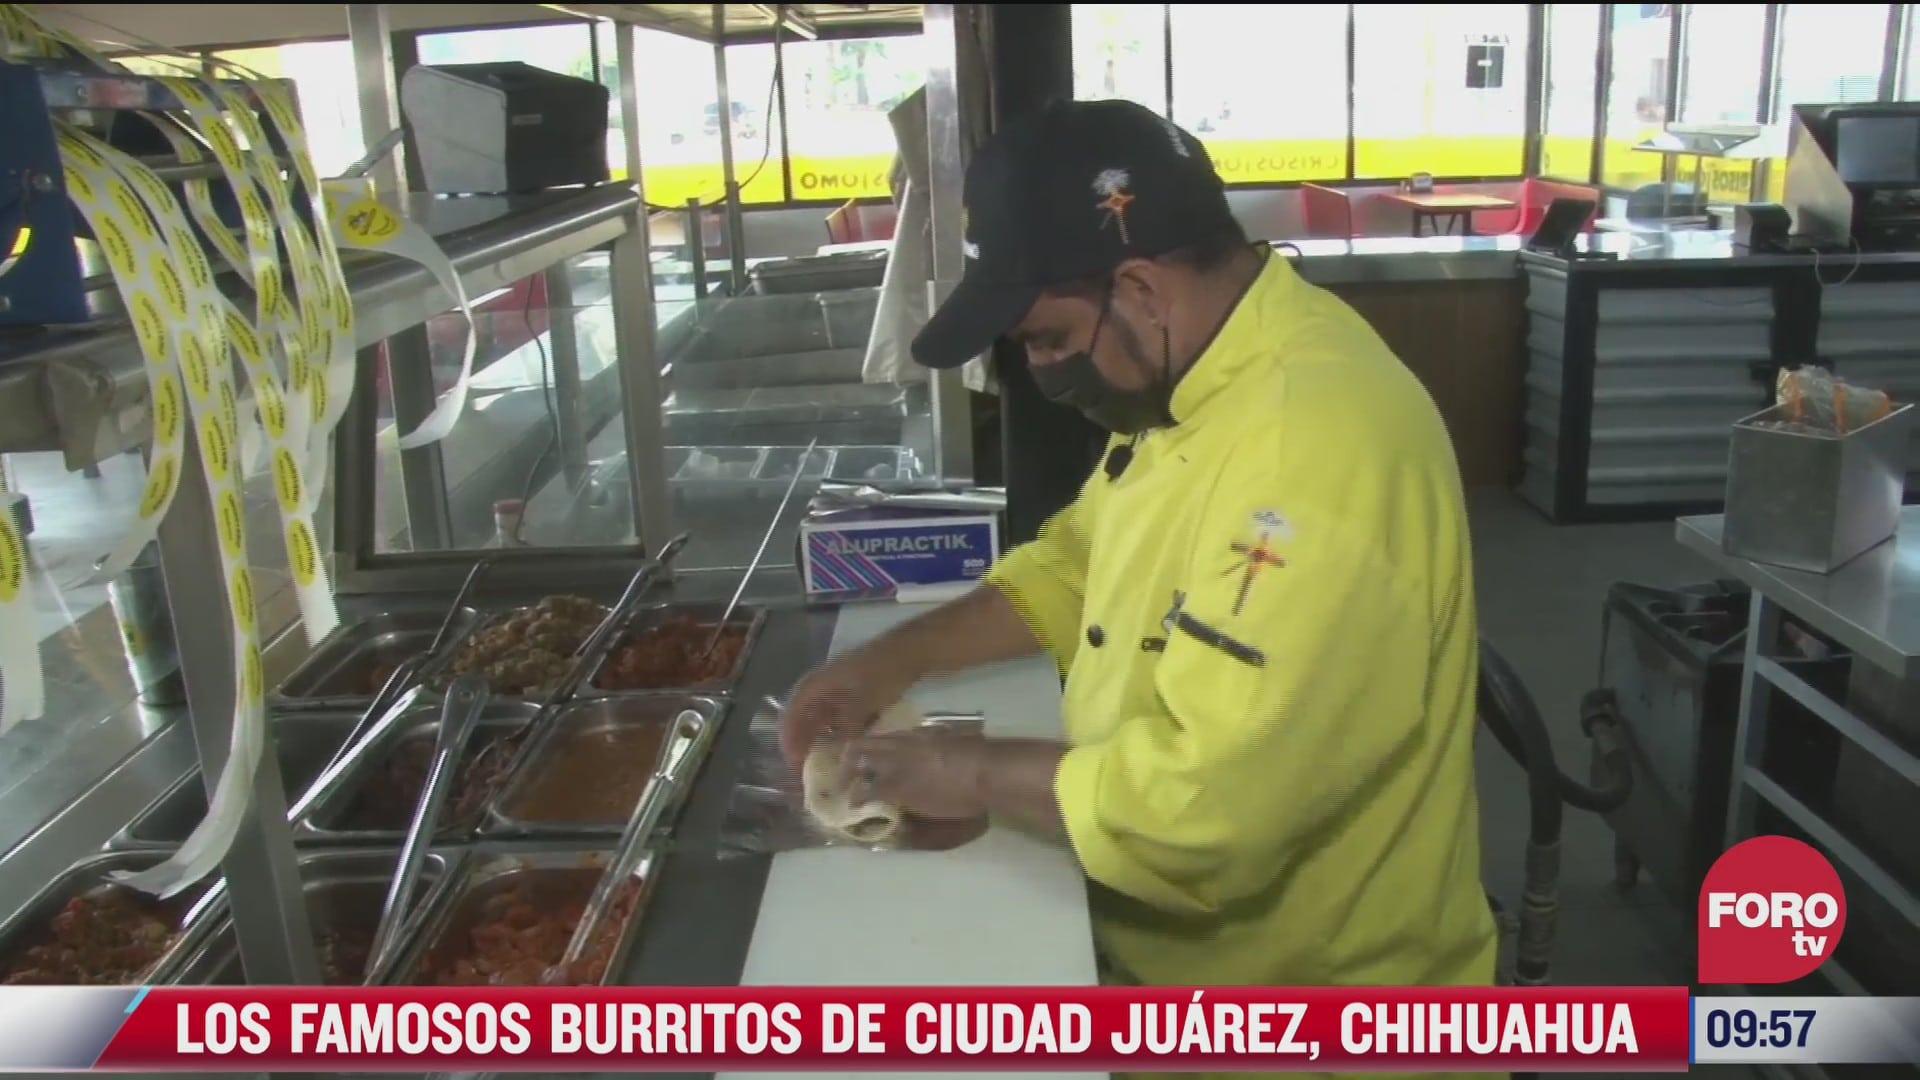 los famosos burritos de ciudad juarez chihuahua